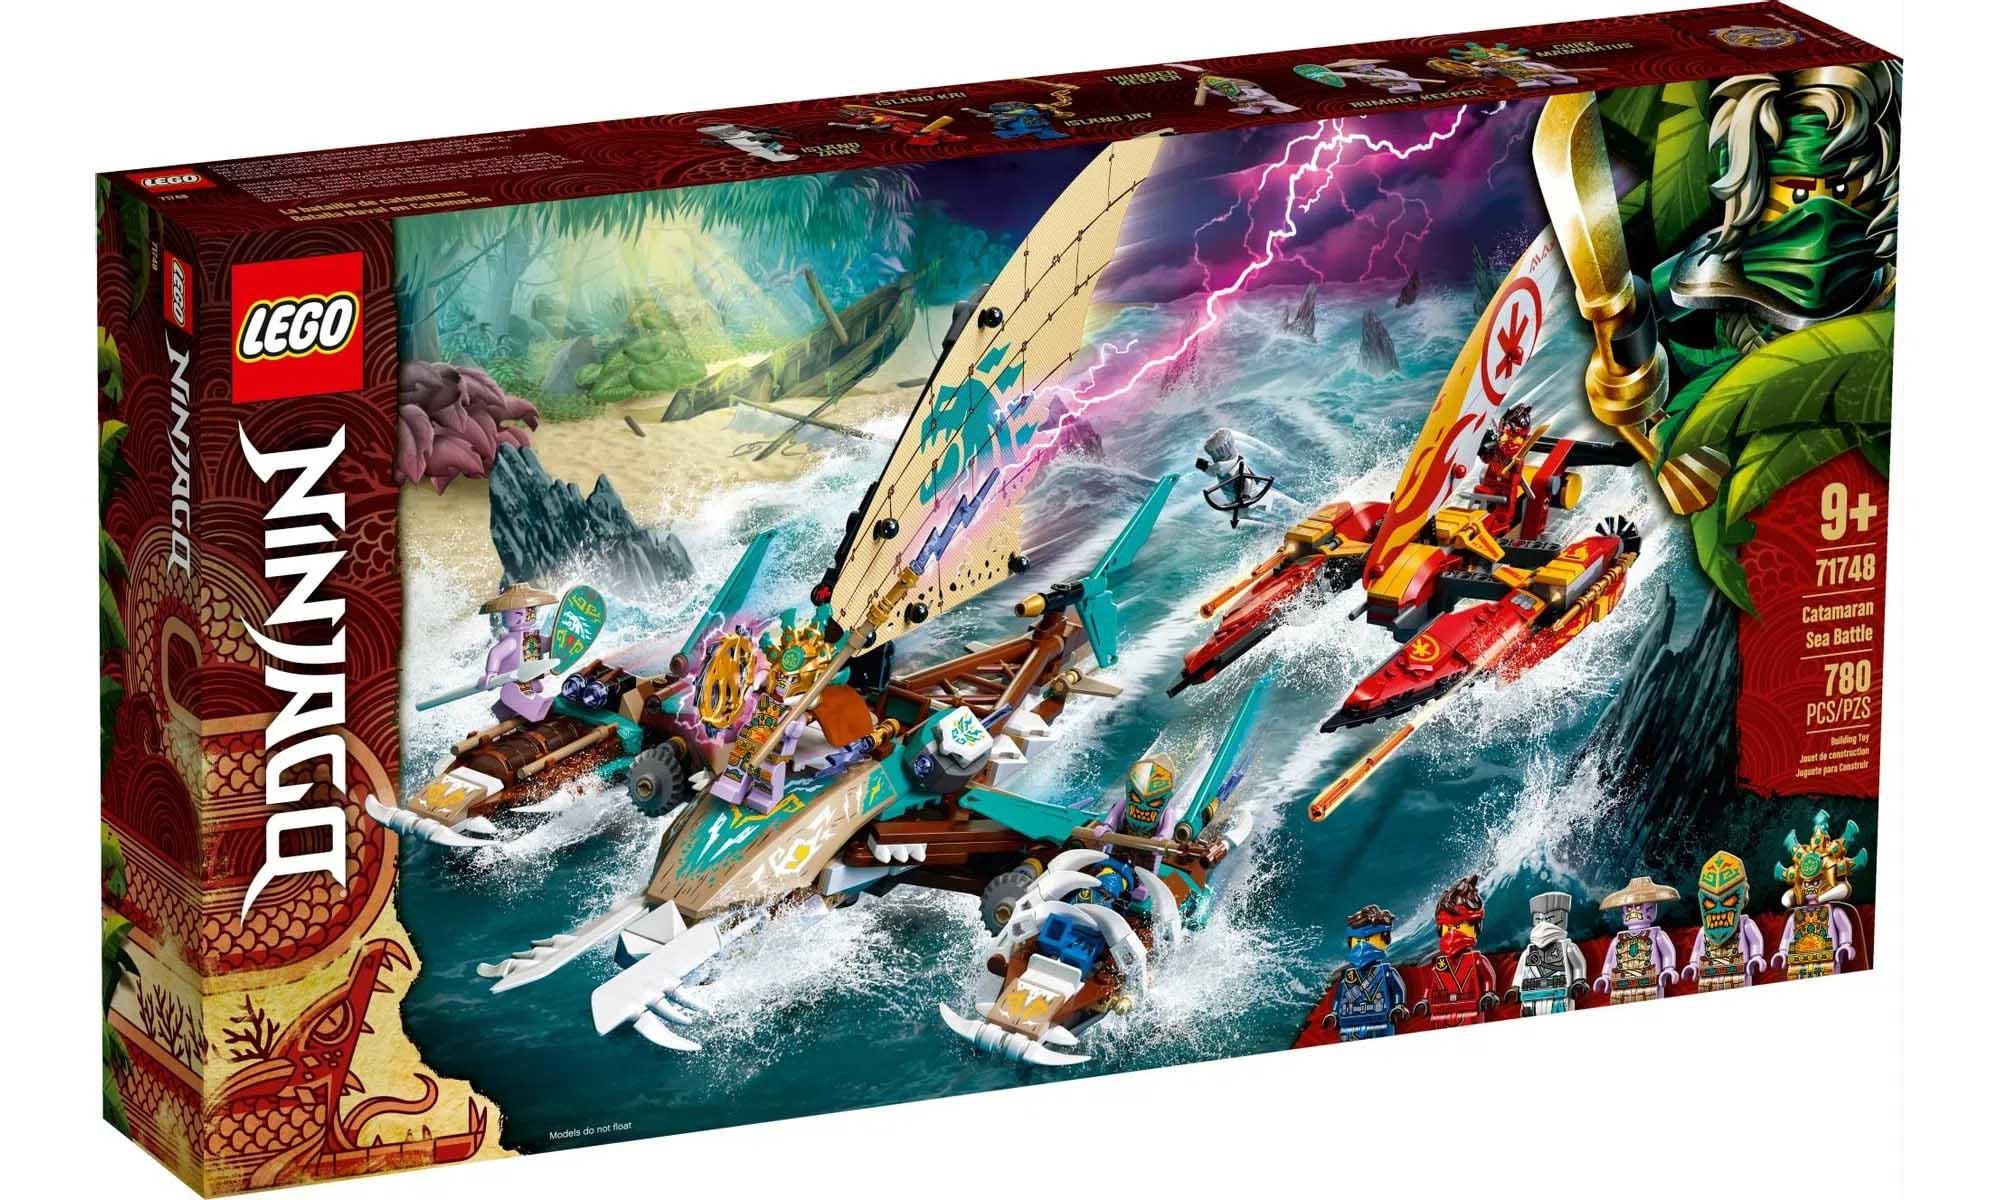 LEGO Ninjago - Combate Naval de Catamarã 71748